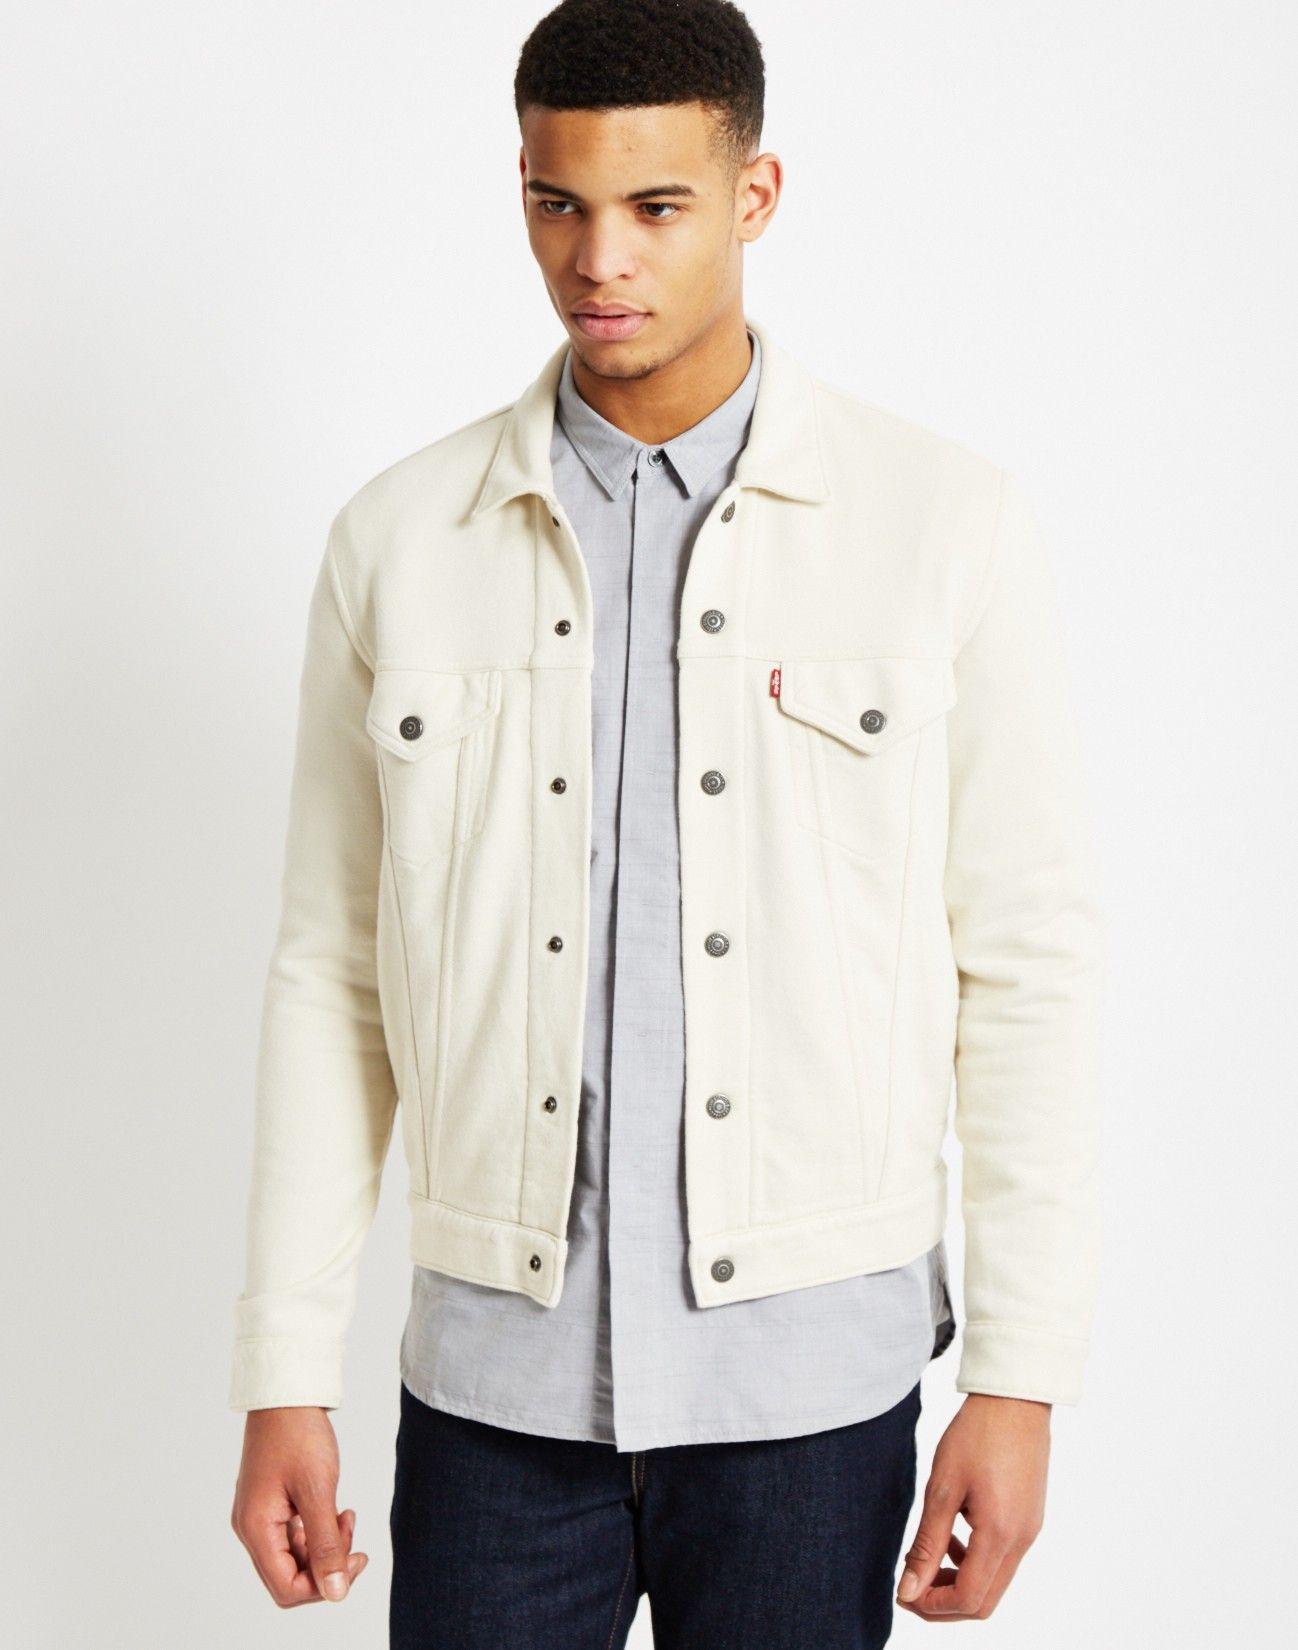 Levi's French Terry Trucker Jacket White   Shop men's clothing ...